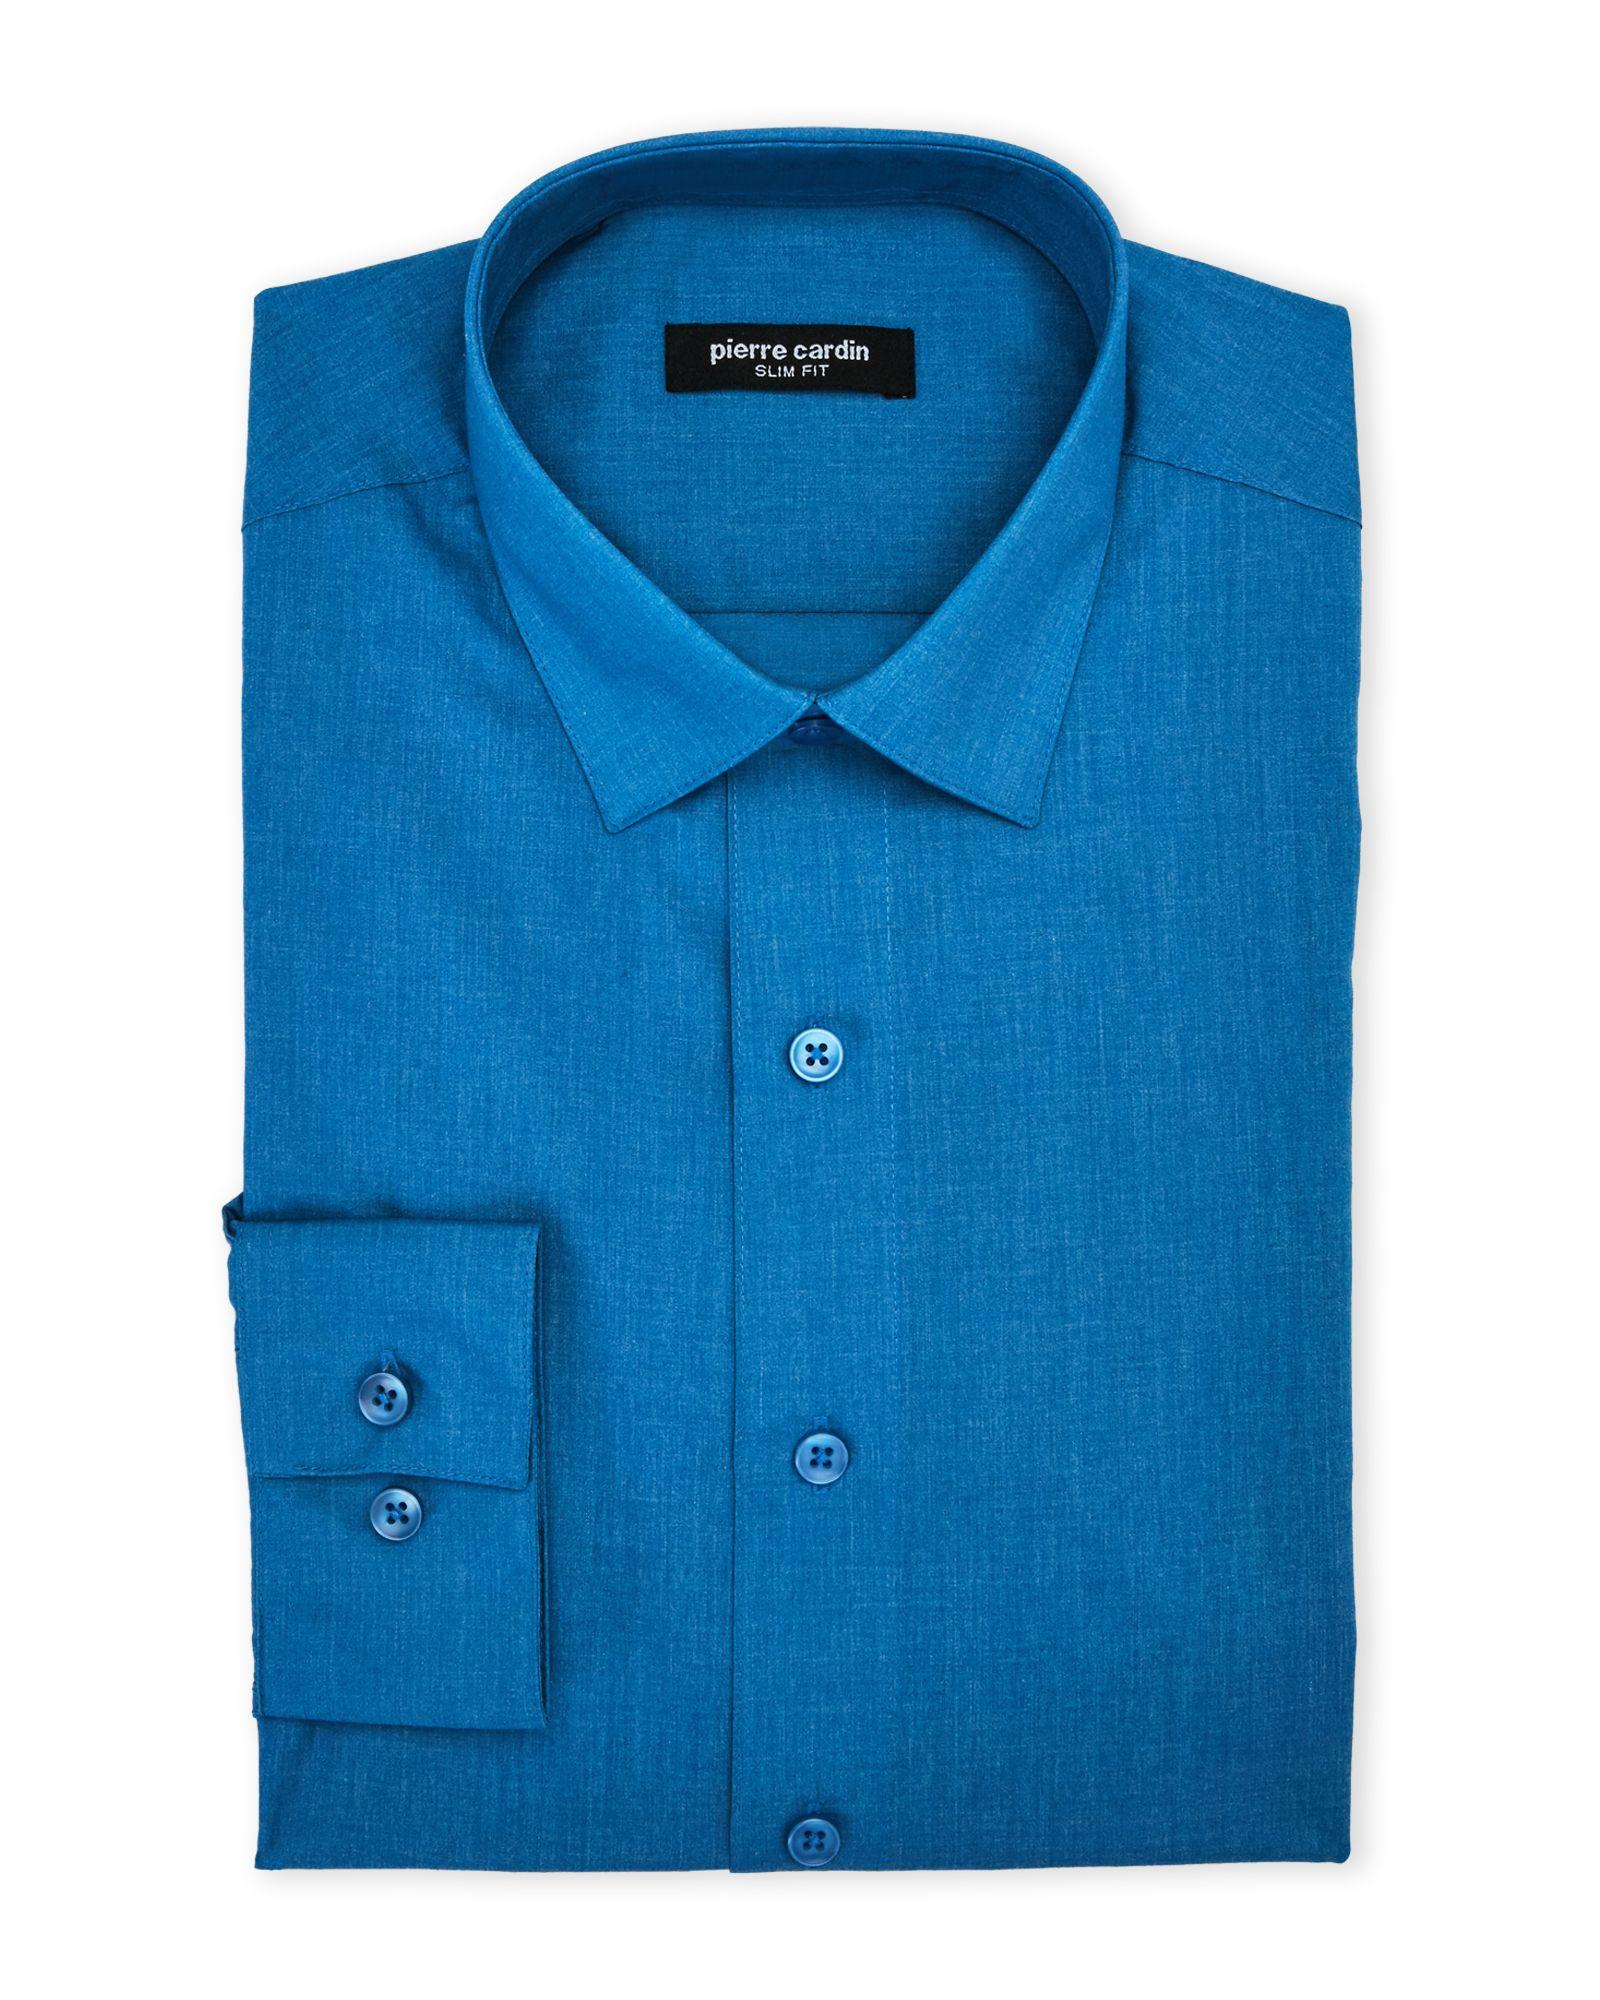 Bright Teal Slim Fit Dress Shirt In 2018 Apparel Accessories